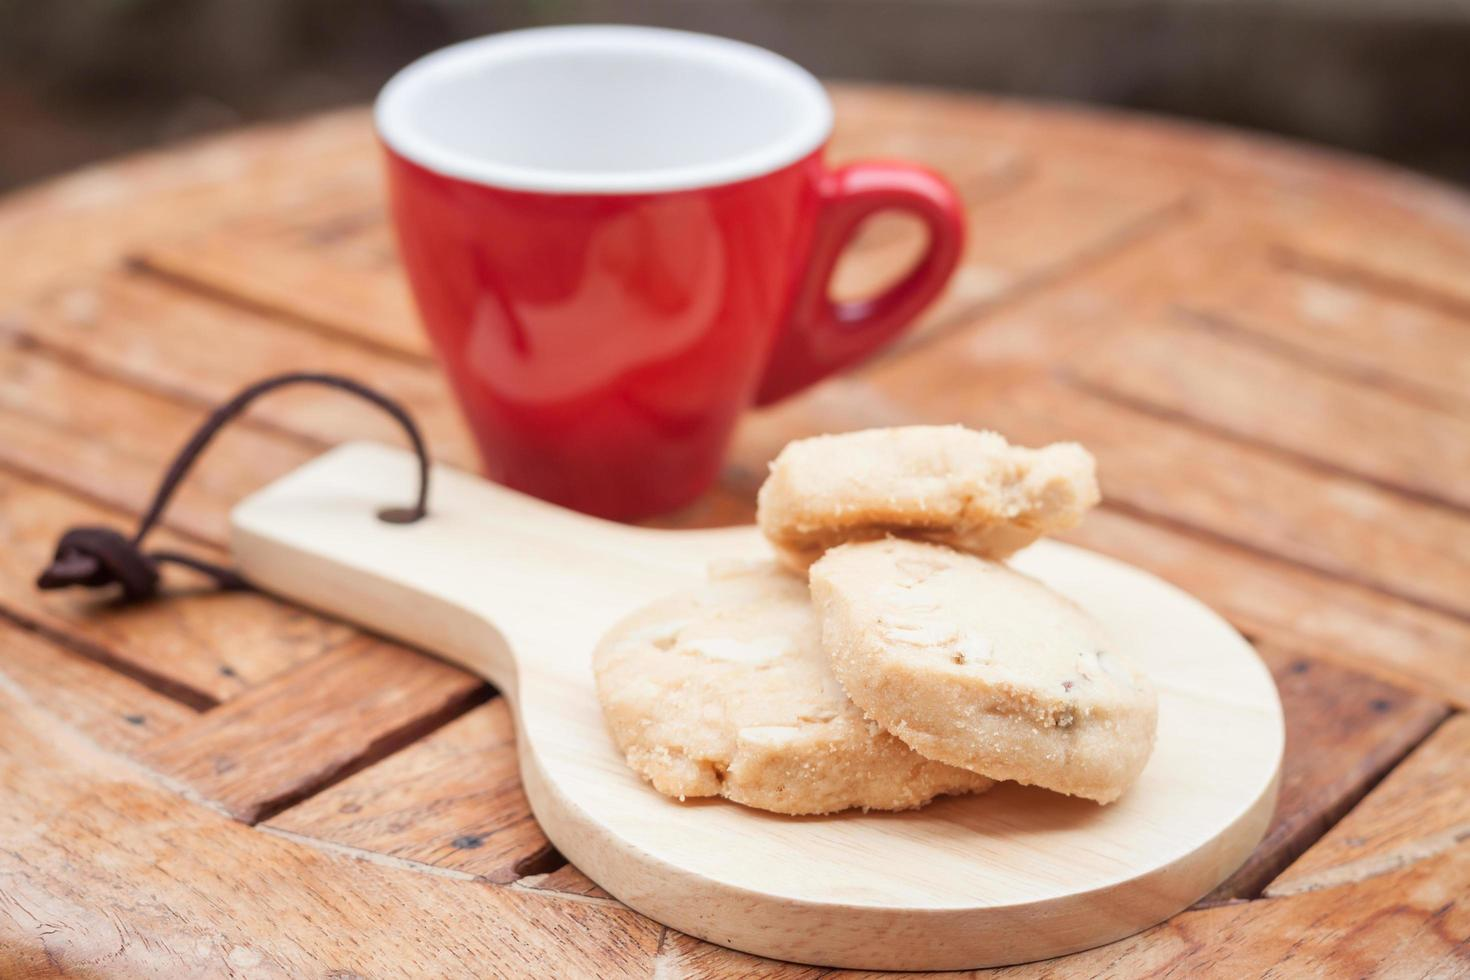 röd kaffekopp och kakor foto